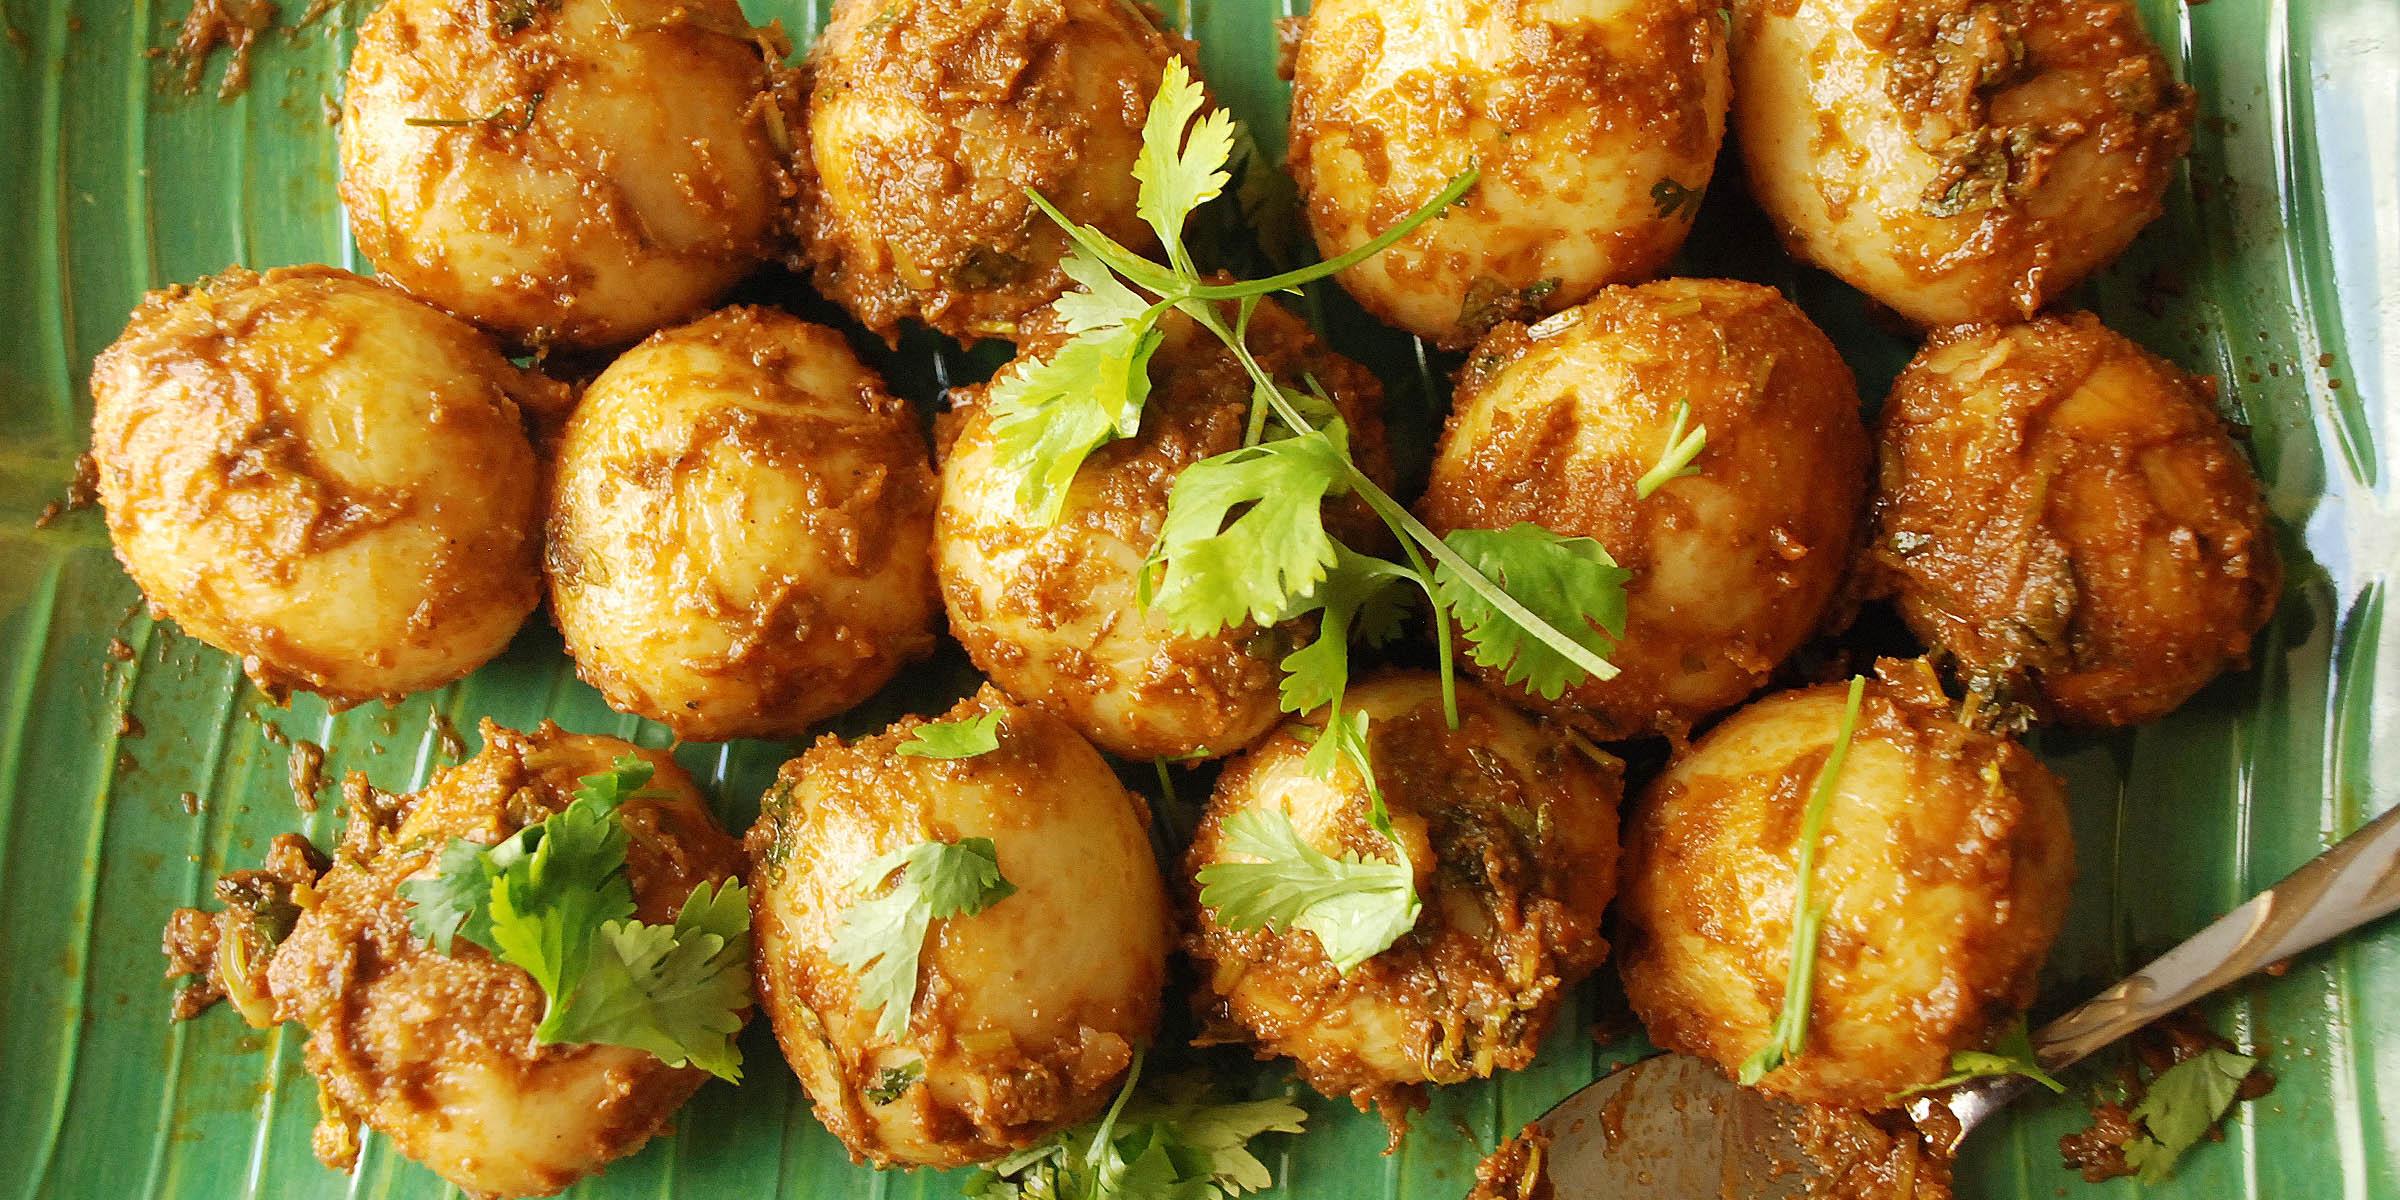 Kolkata style spicy Aloor Dum with baby potatoes